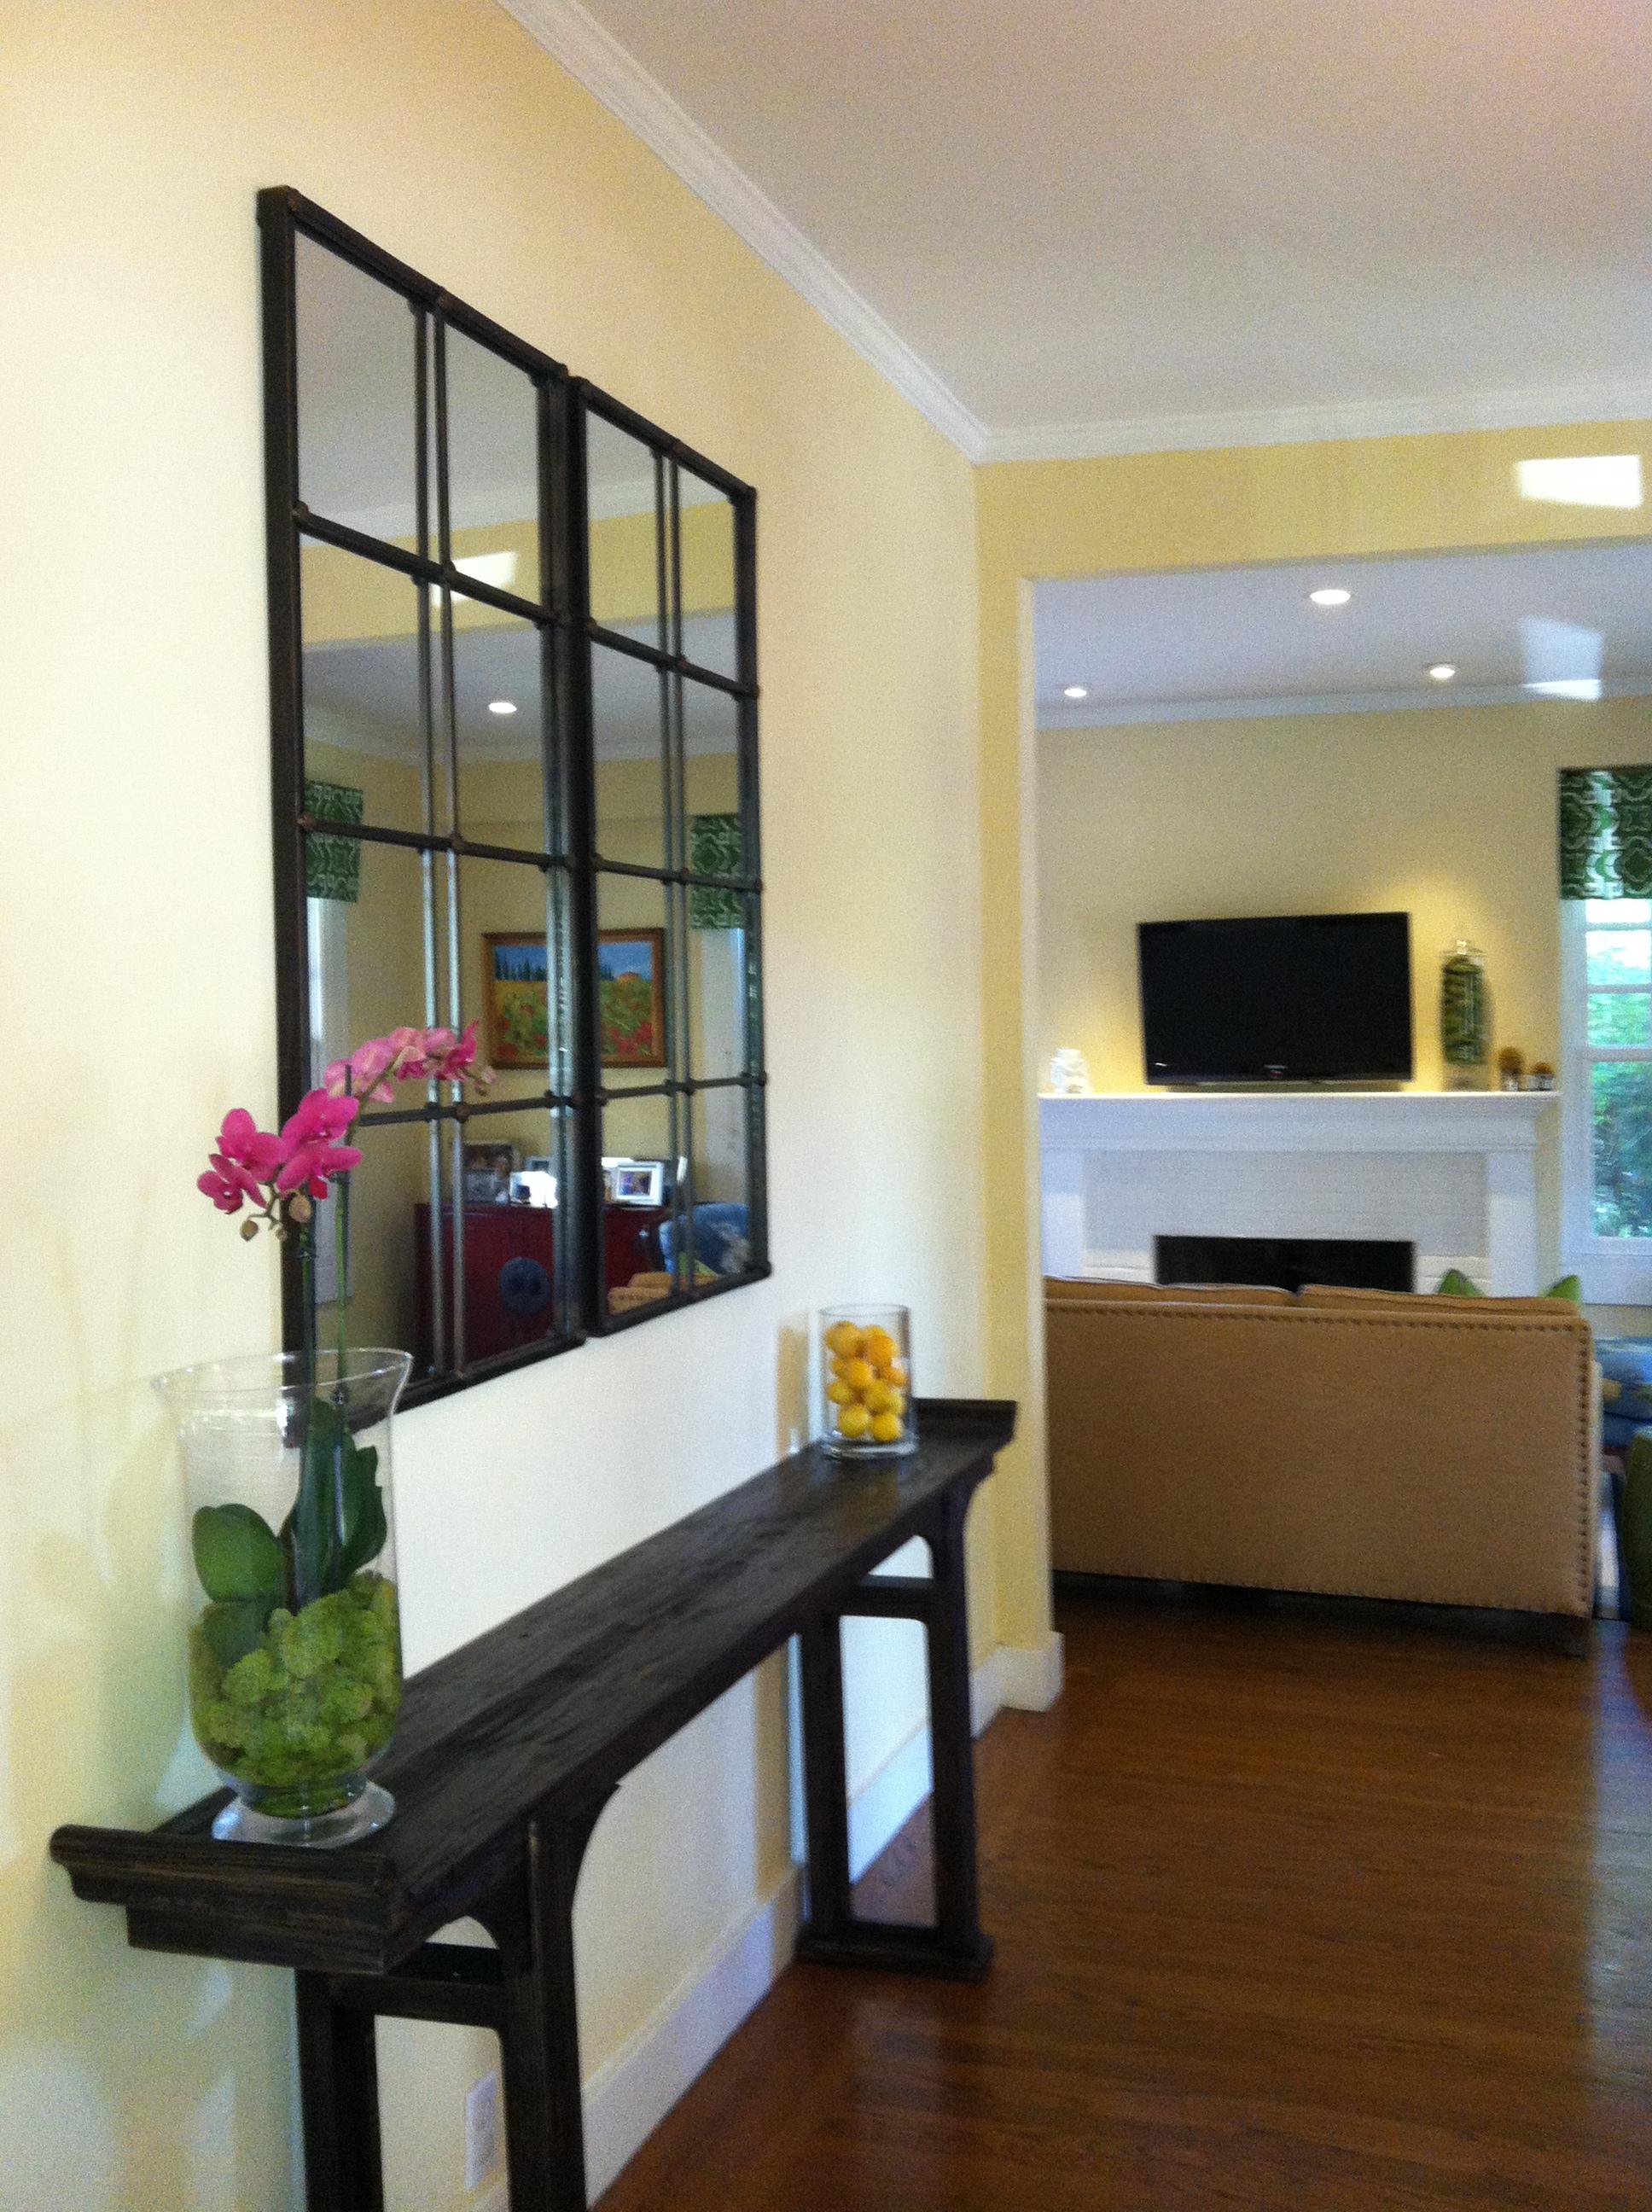 Windowpane Mirrors Ideas - HomesFeed